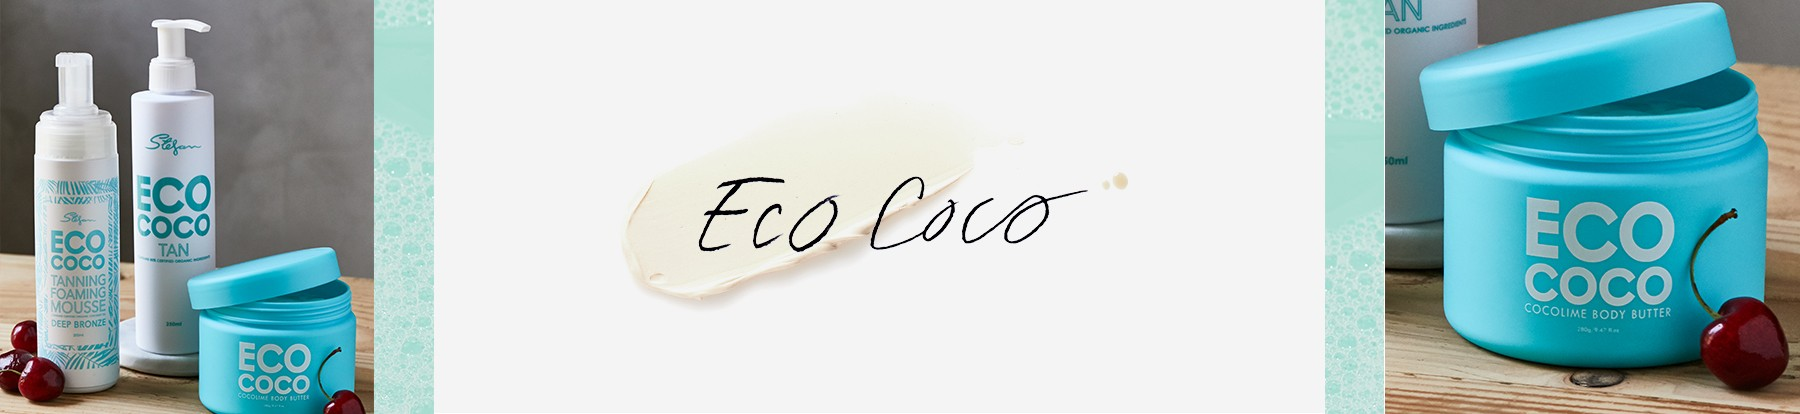 Eco Coco